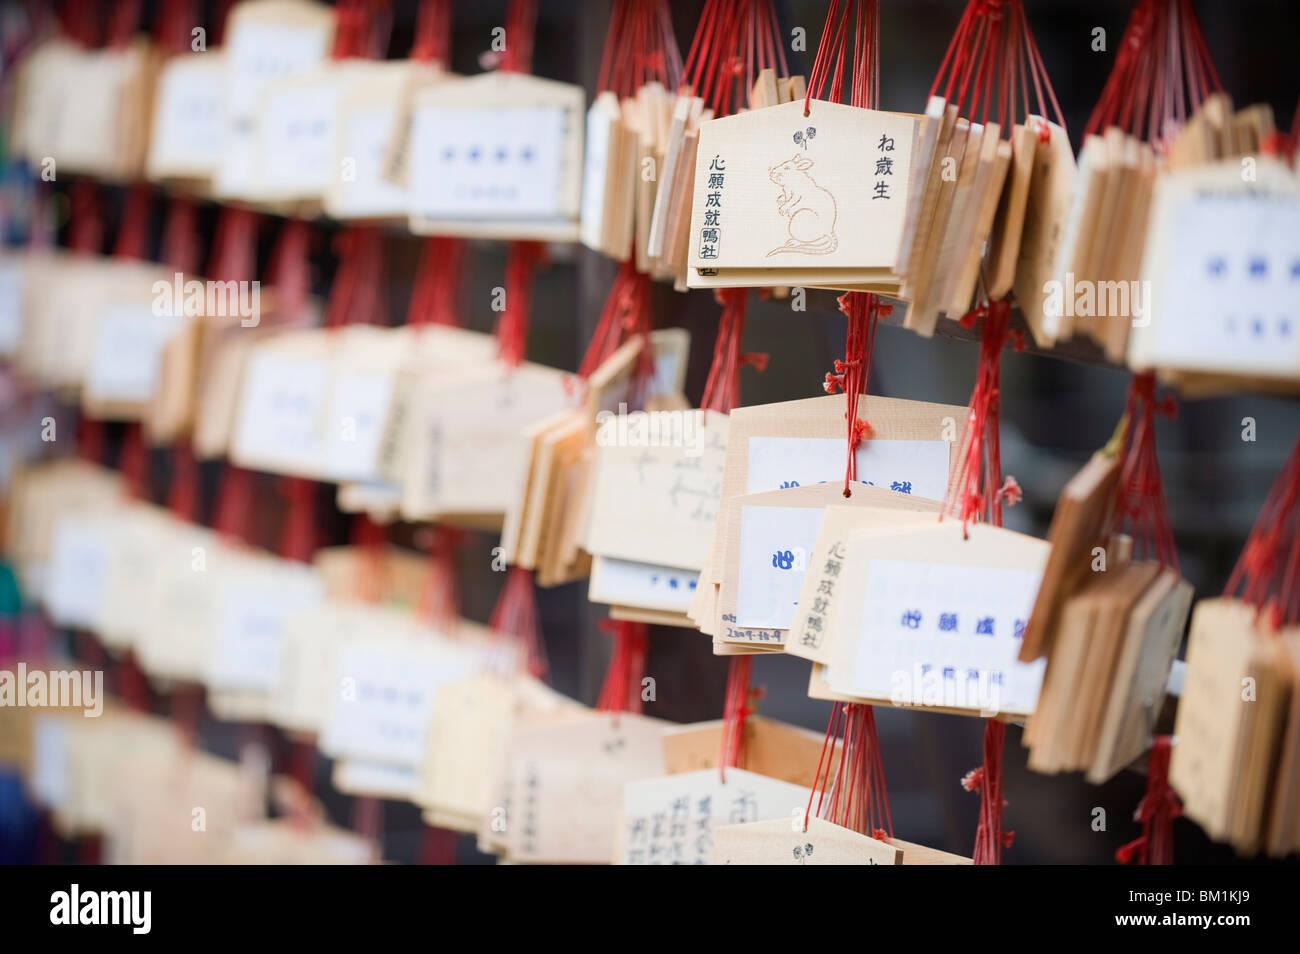 Good luck messages written on wooden prayer tablets, Shimogamo Shrine, Tadasu no Mori, Kyoto, Japan, Asia - Stock Image